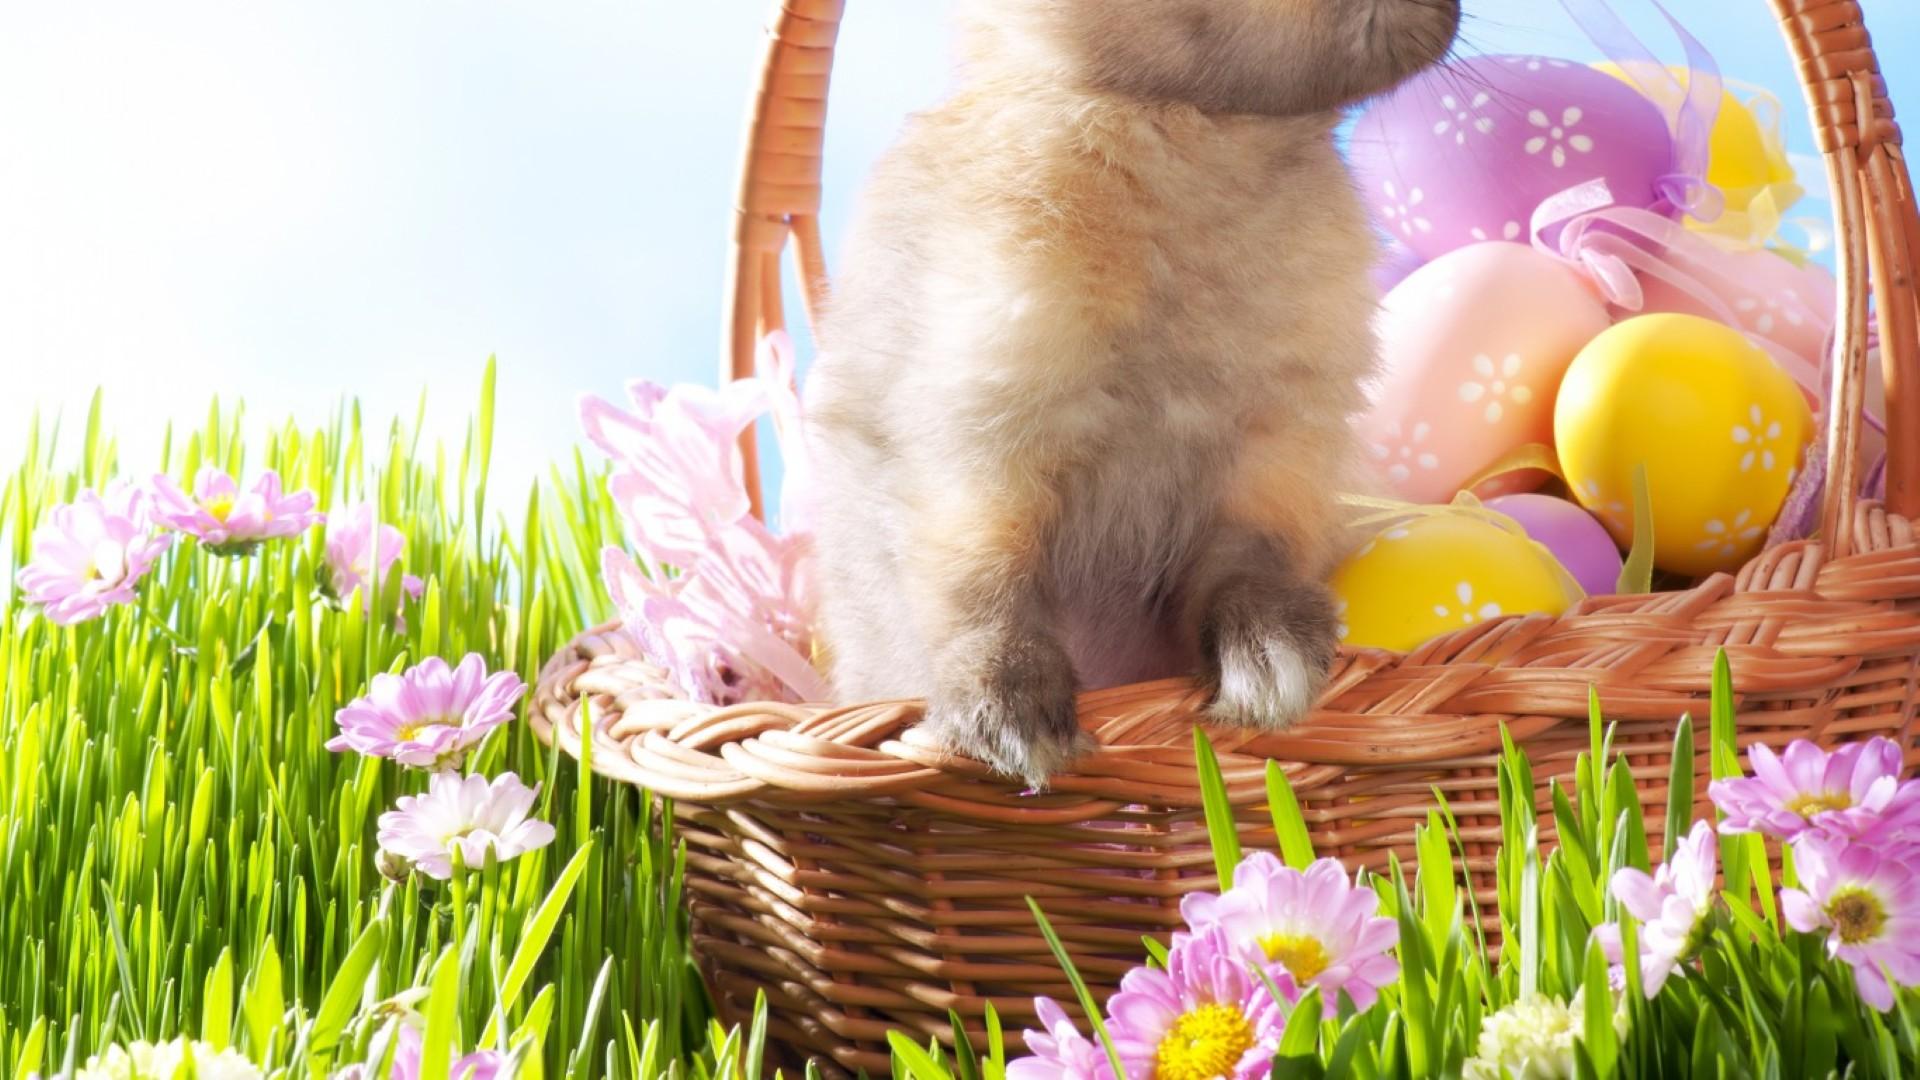 Easter Wallpaper HD for your Desktop 1920x1080